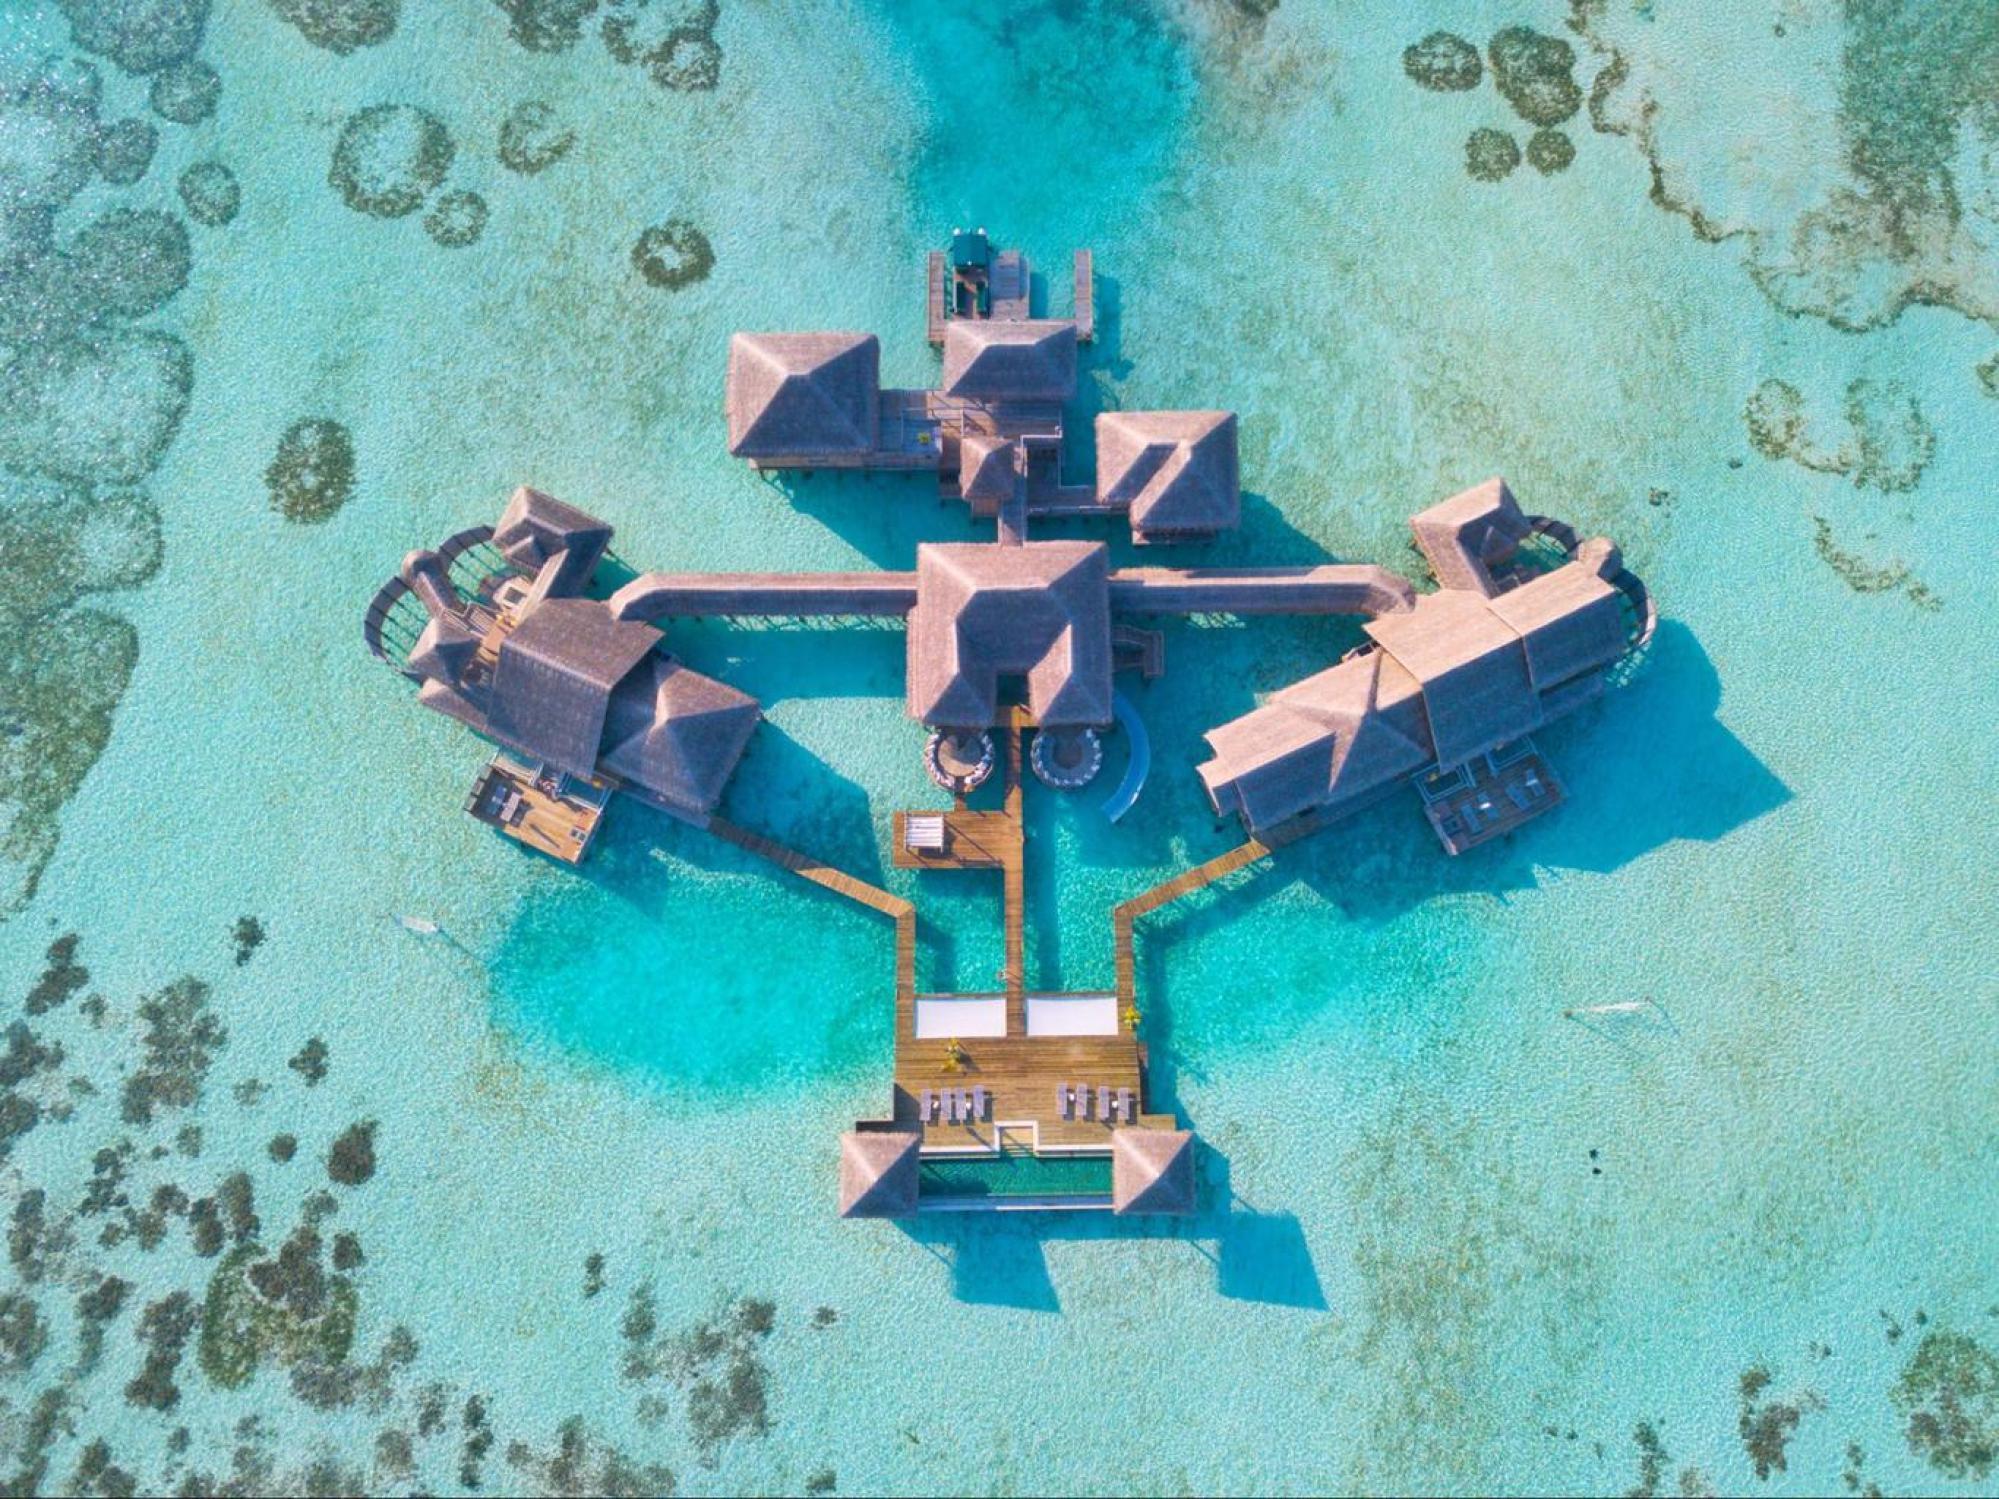 Private Reserve at Gili Lankanfushi drone shot